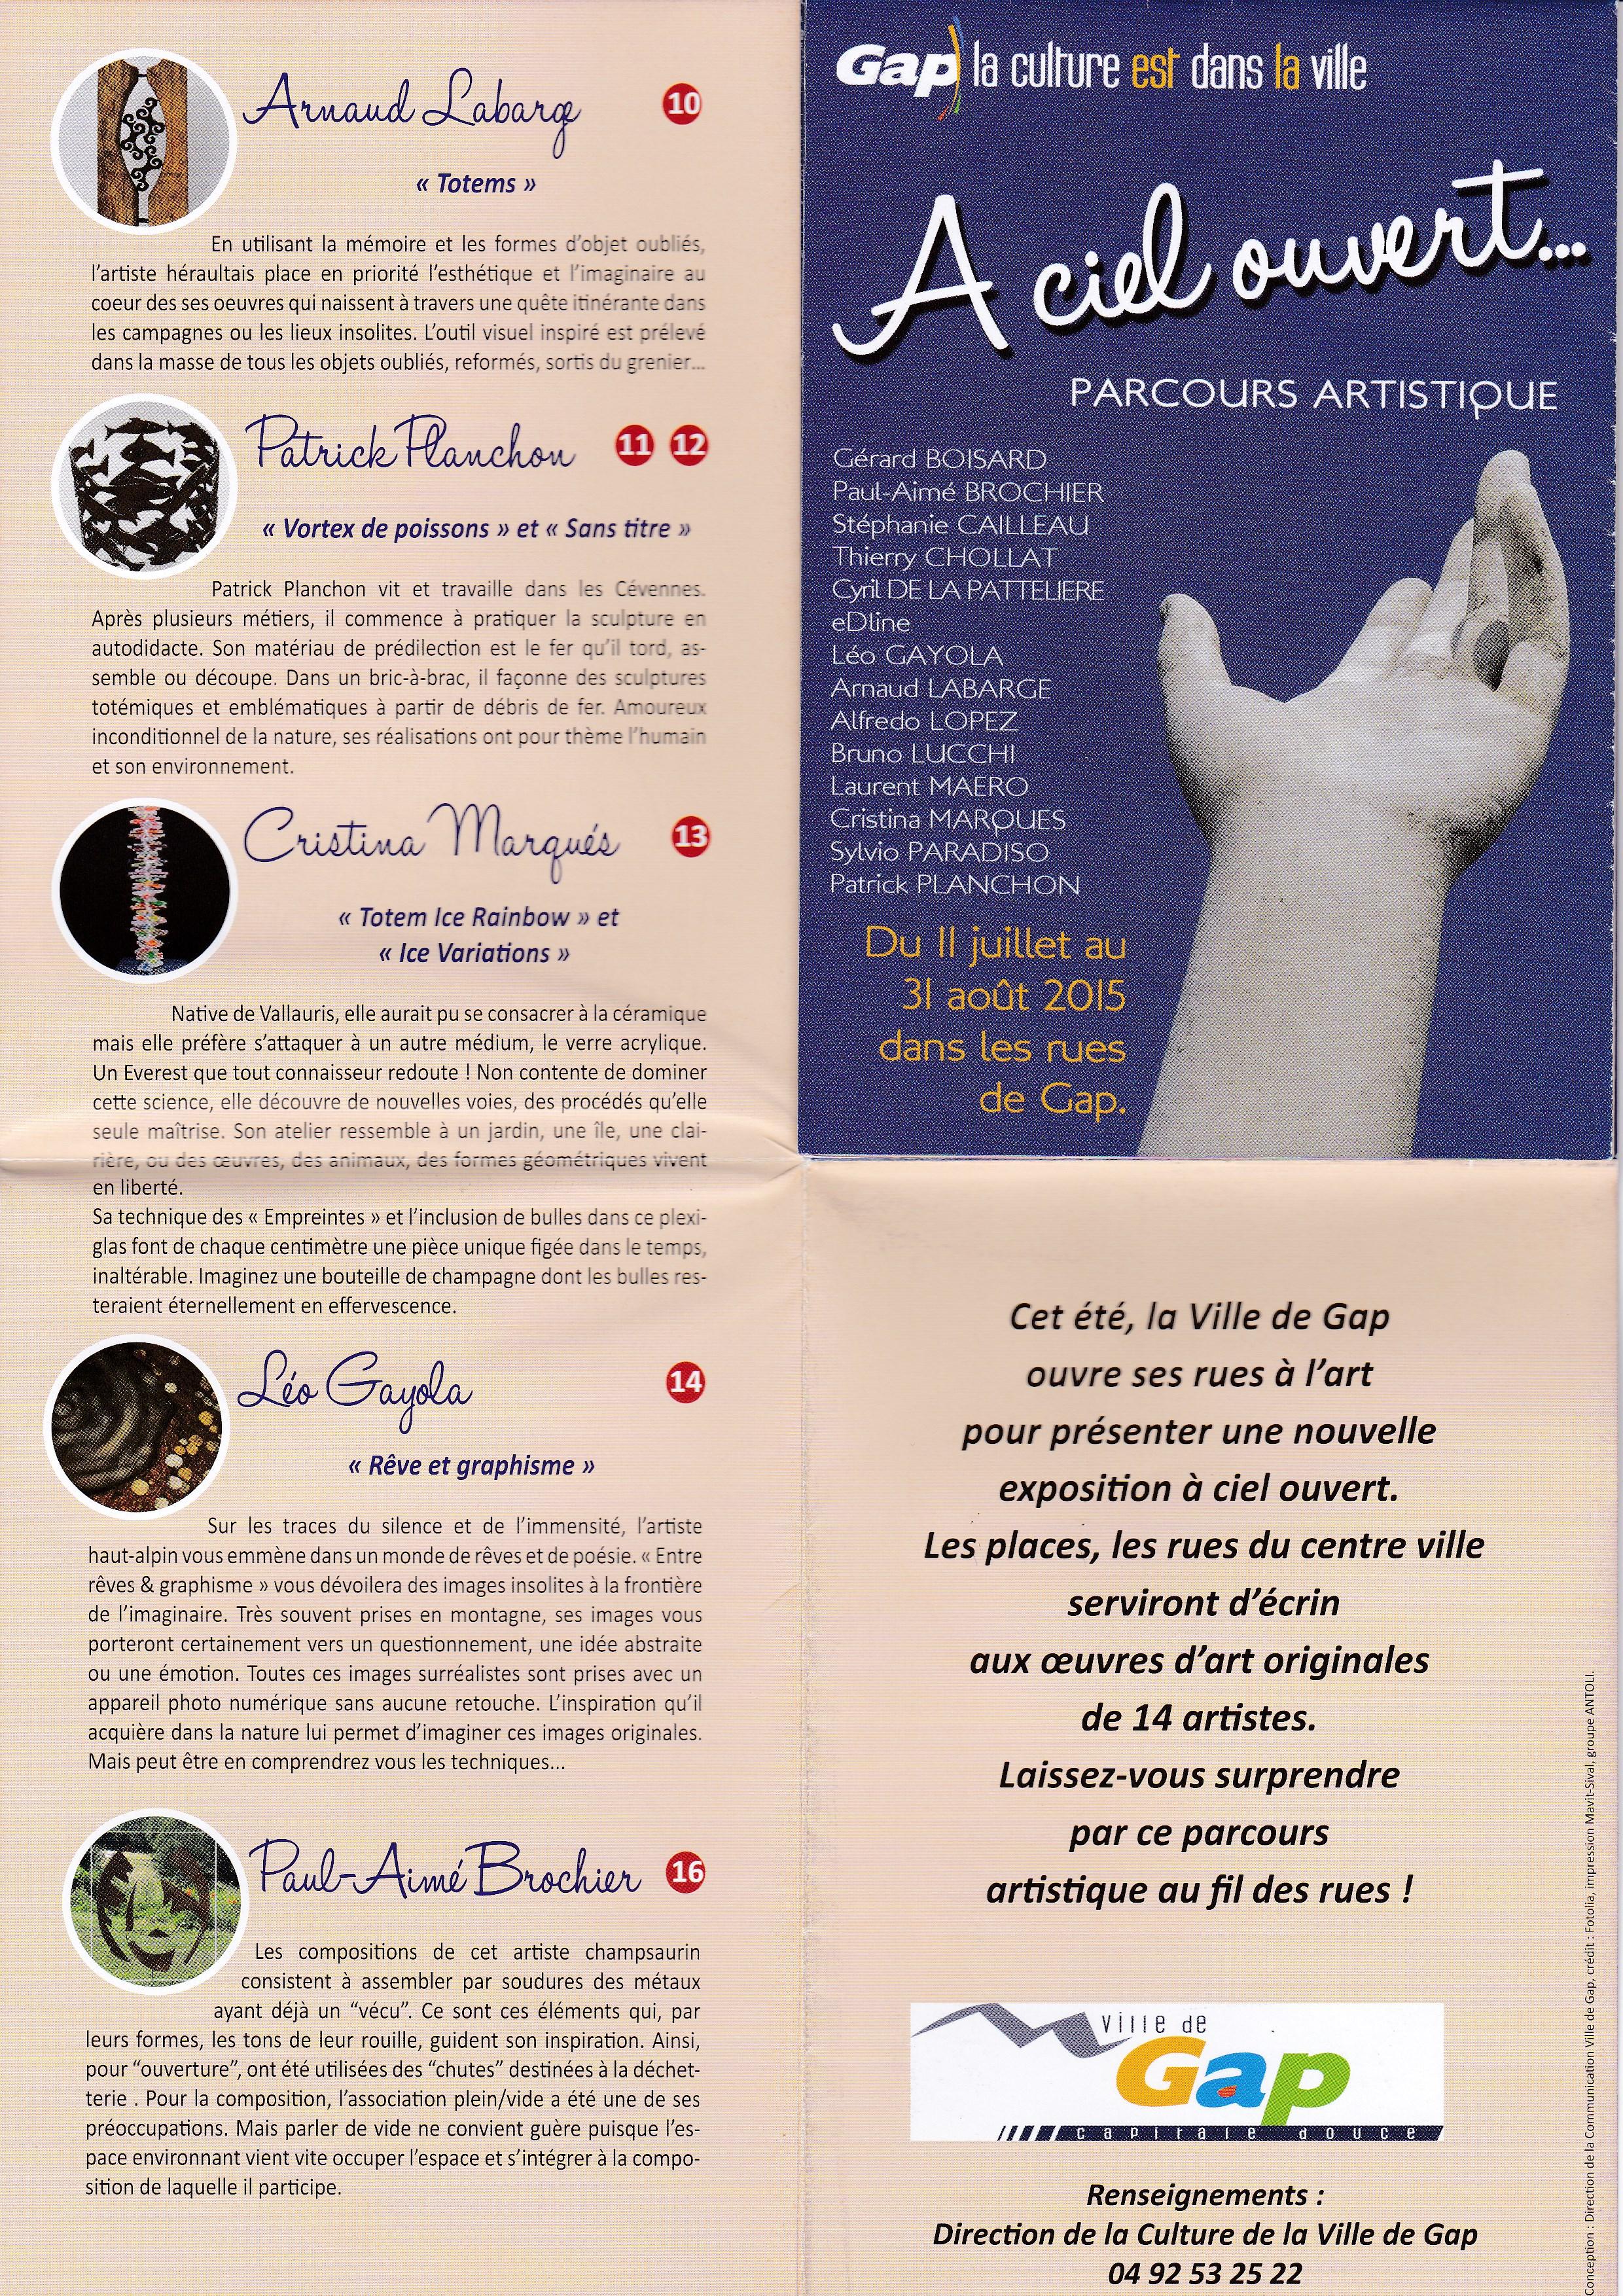 Dépliant Expo A Ciel Ouvert_20150718